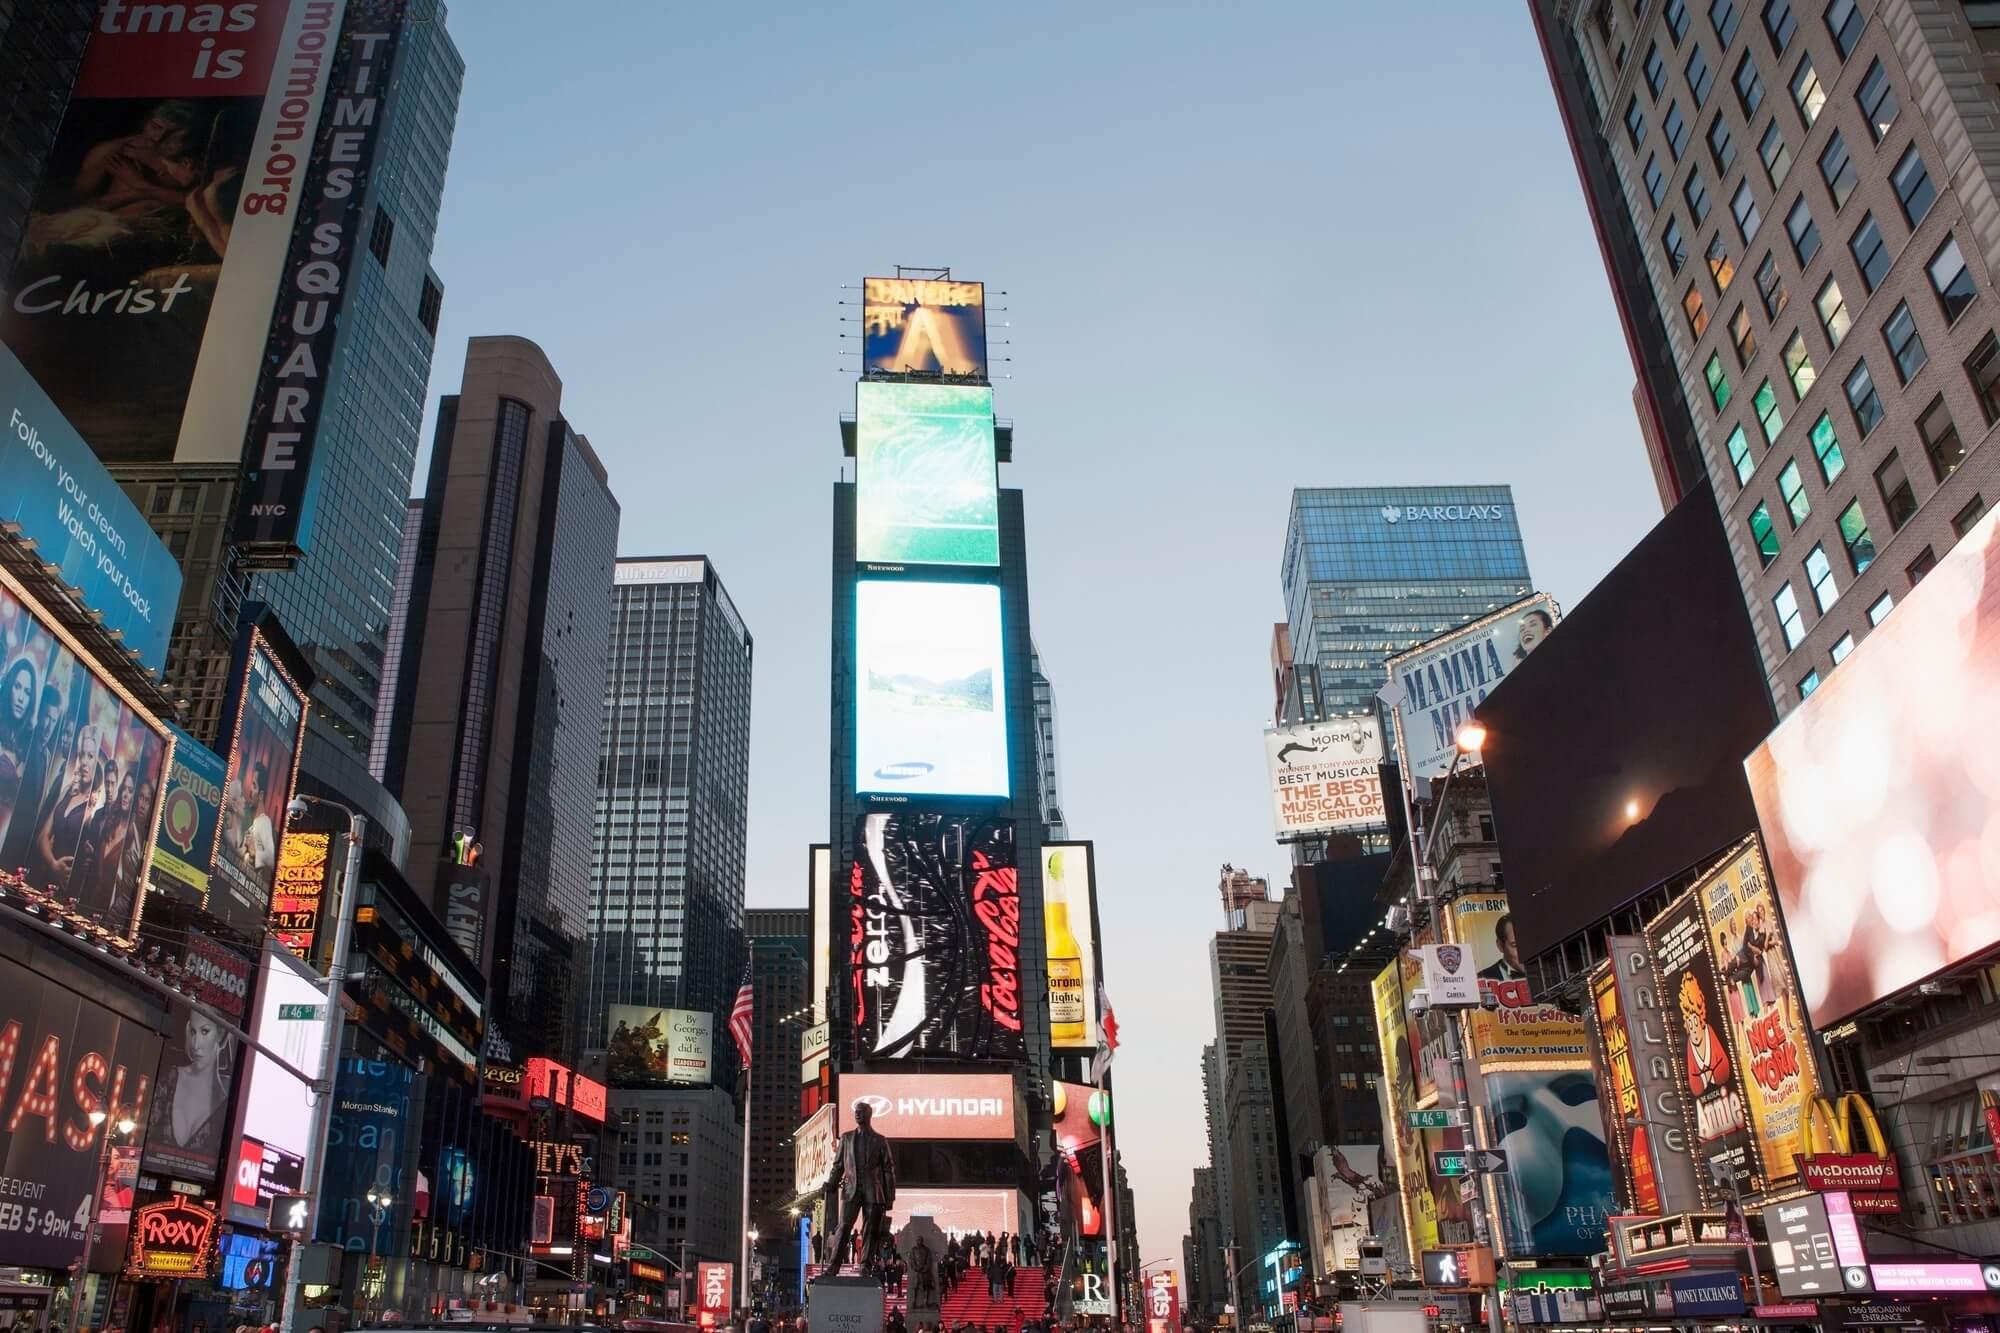 Time Square Billboards Mural & Time Square Billboards